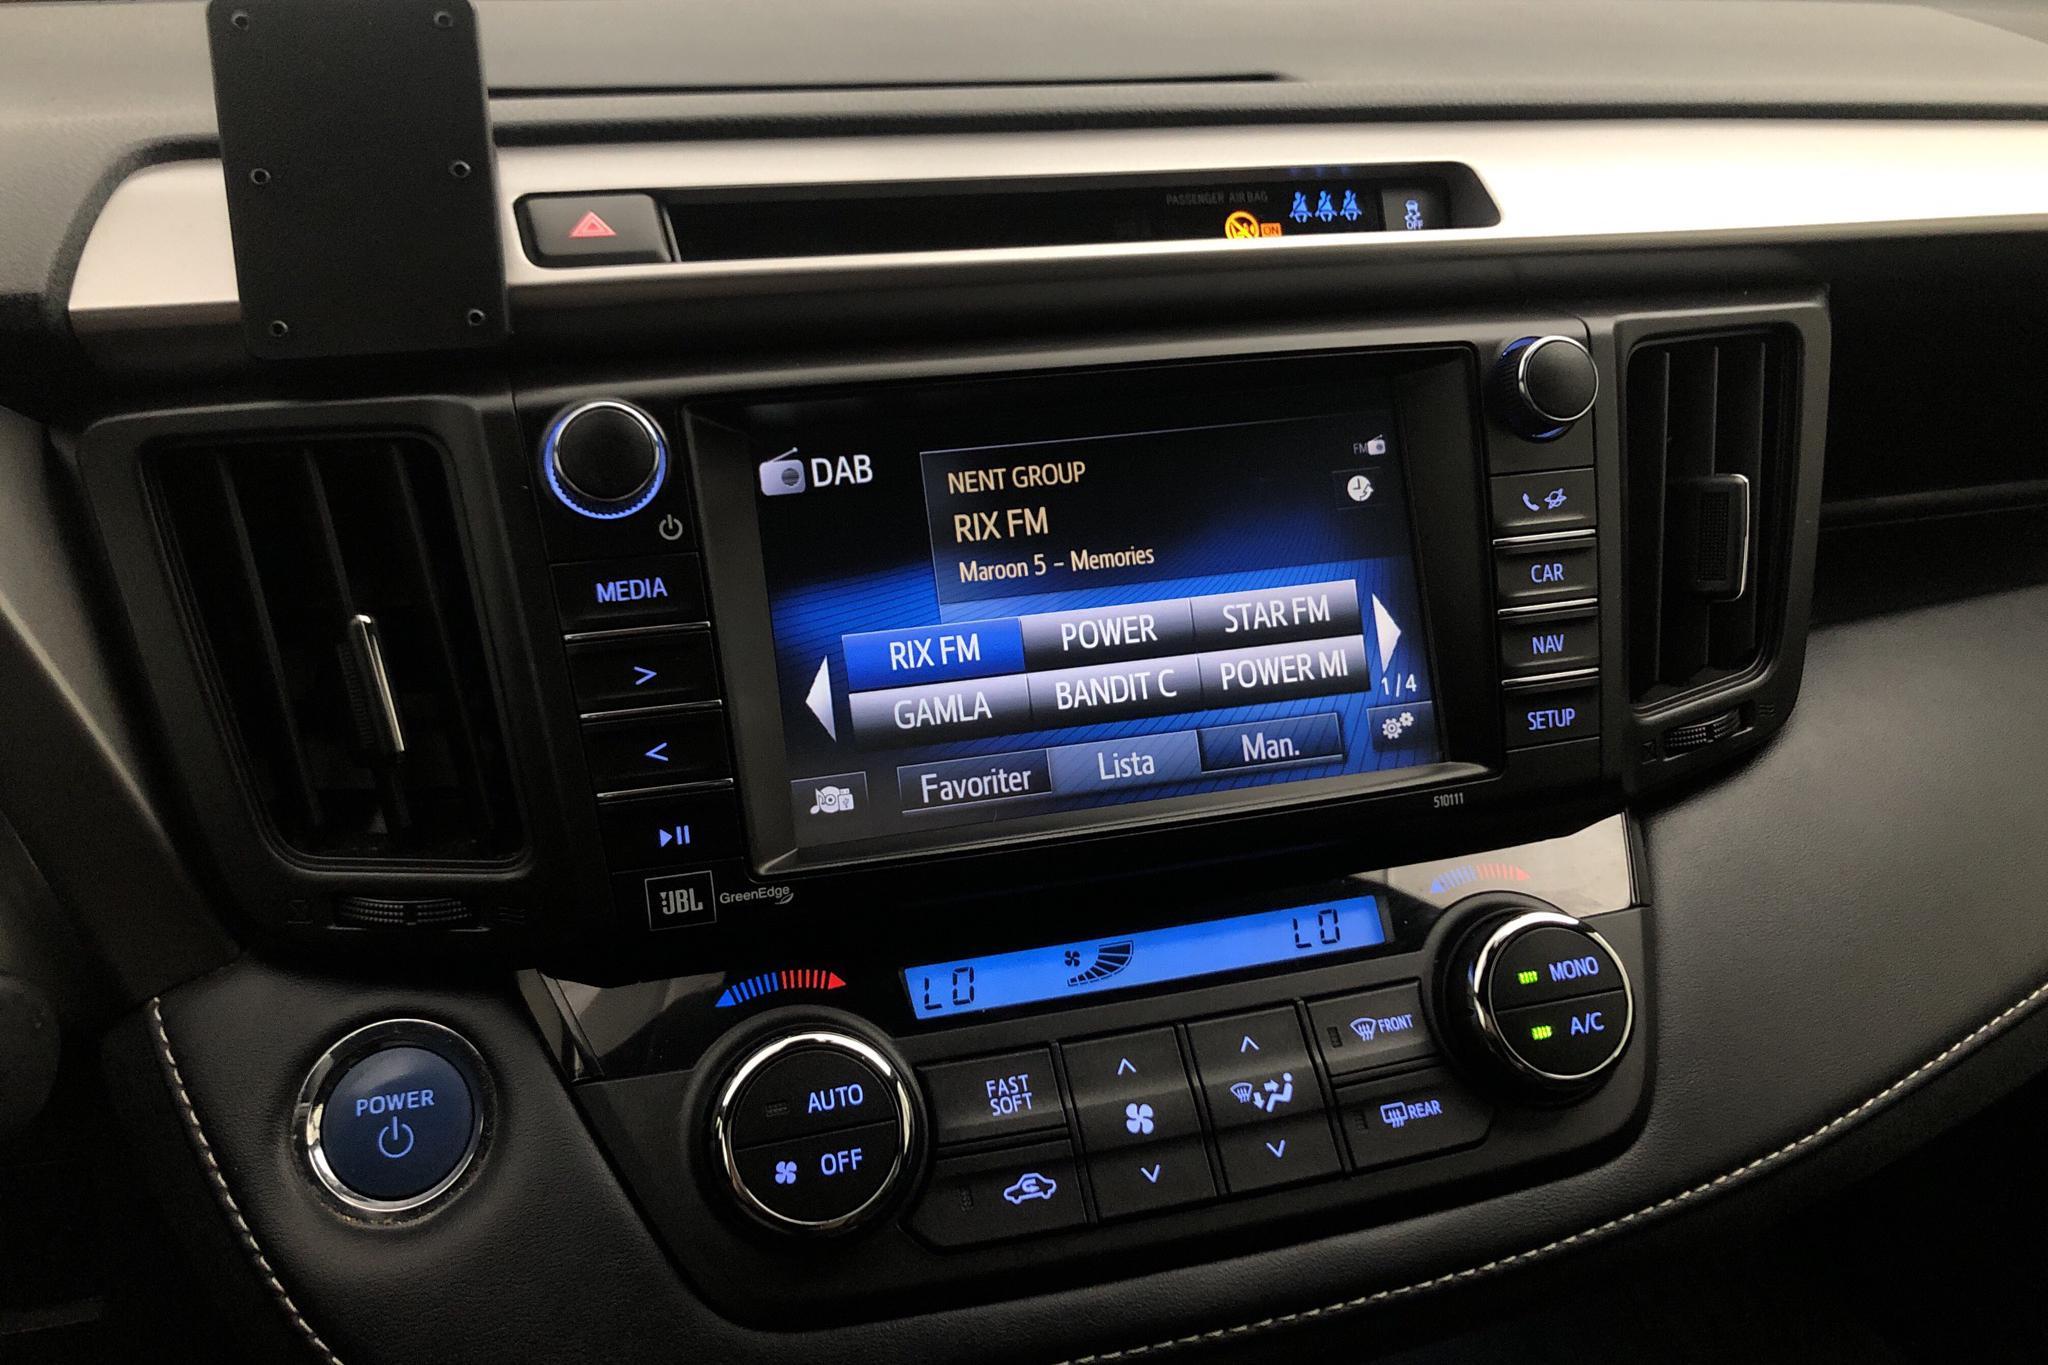 Toyota RAV4 2.5 HSD AWD (197hk) - 86 250 km - Automatic - Dark Grey - 2018